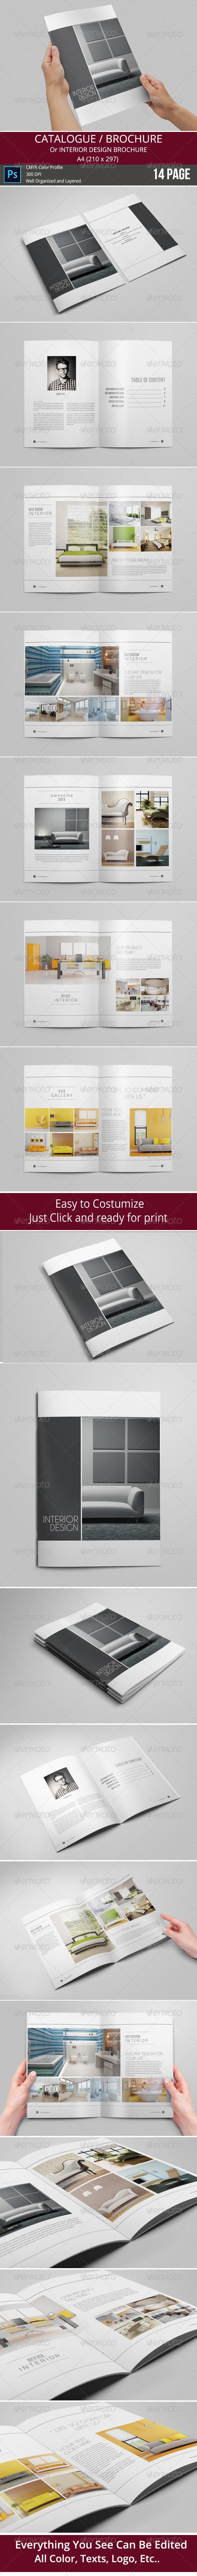 GraphicRiver Catalogue Brochure 8416629